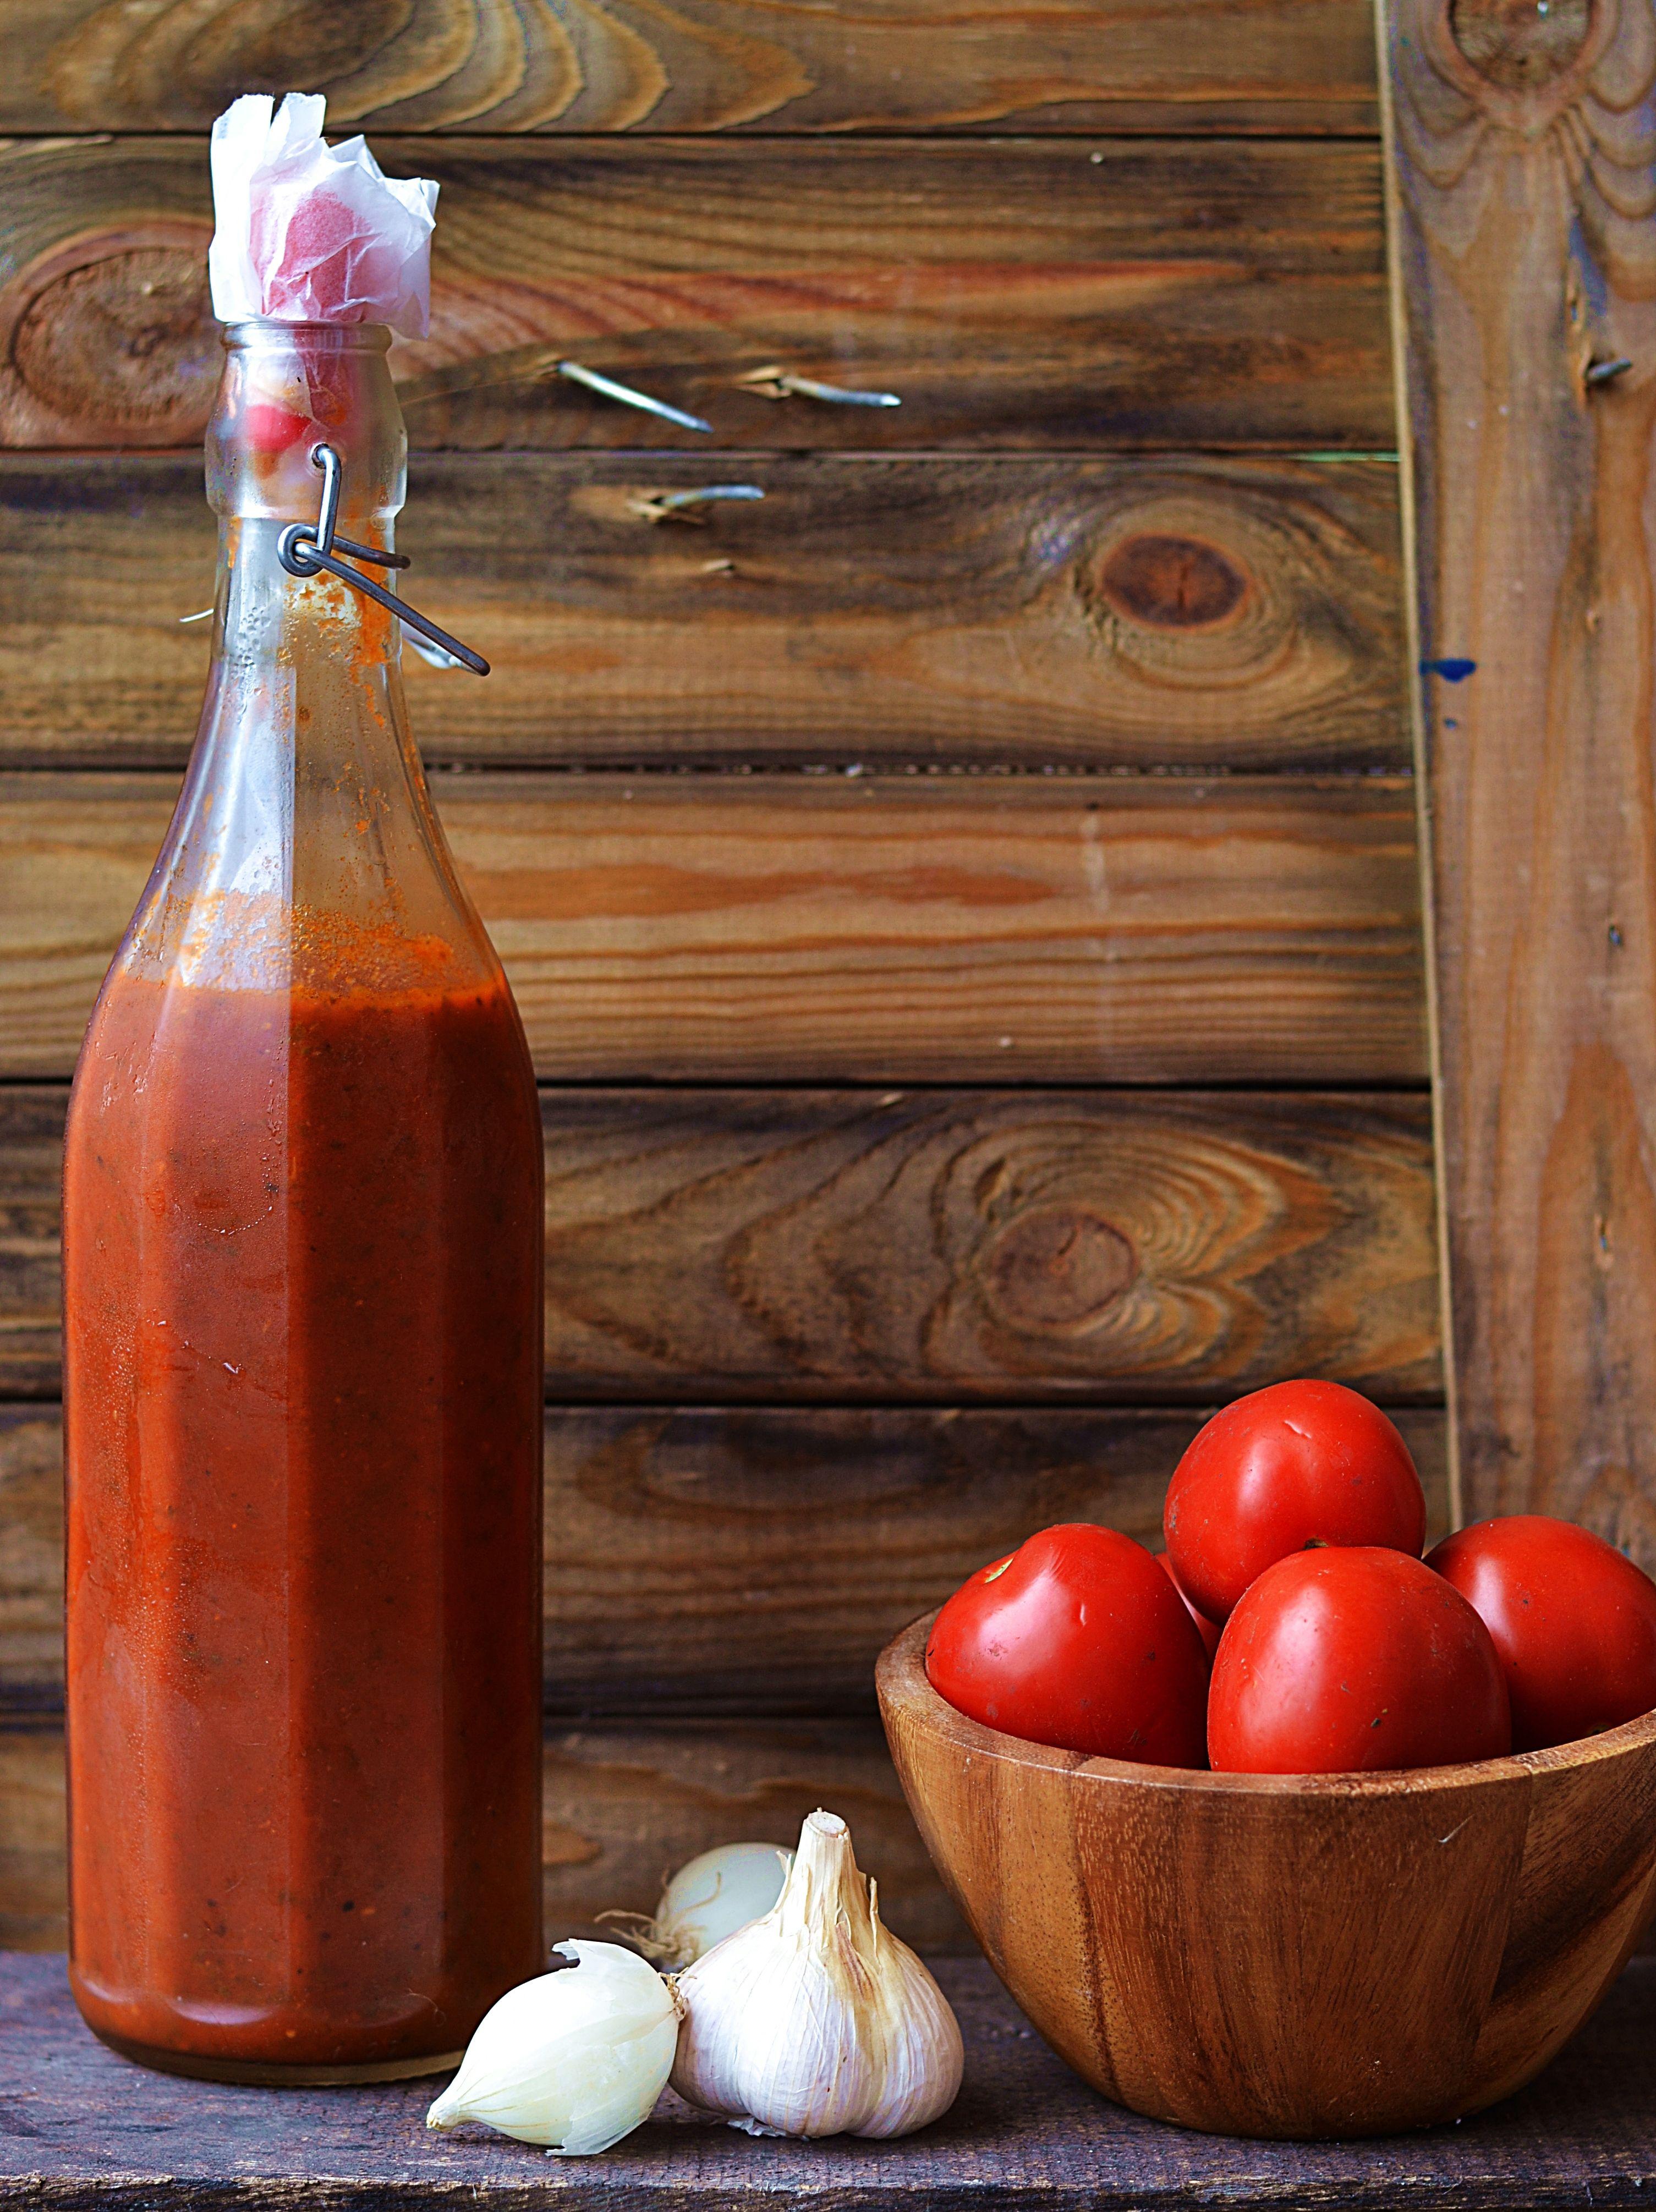 da kann der heinz einpacken ketchup ganz leicht selber machen clean eating pinterest. Black Bedroom Furniture Sets. Home Design Ideas